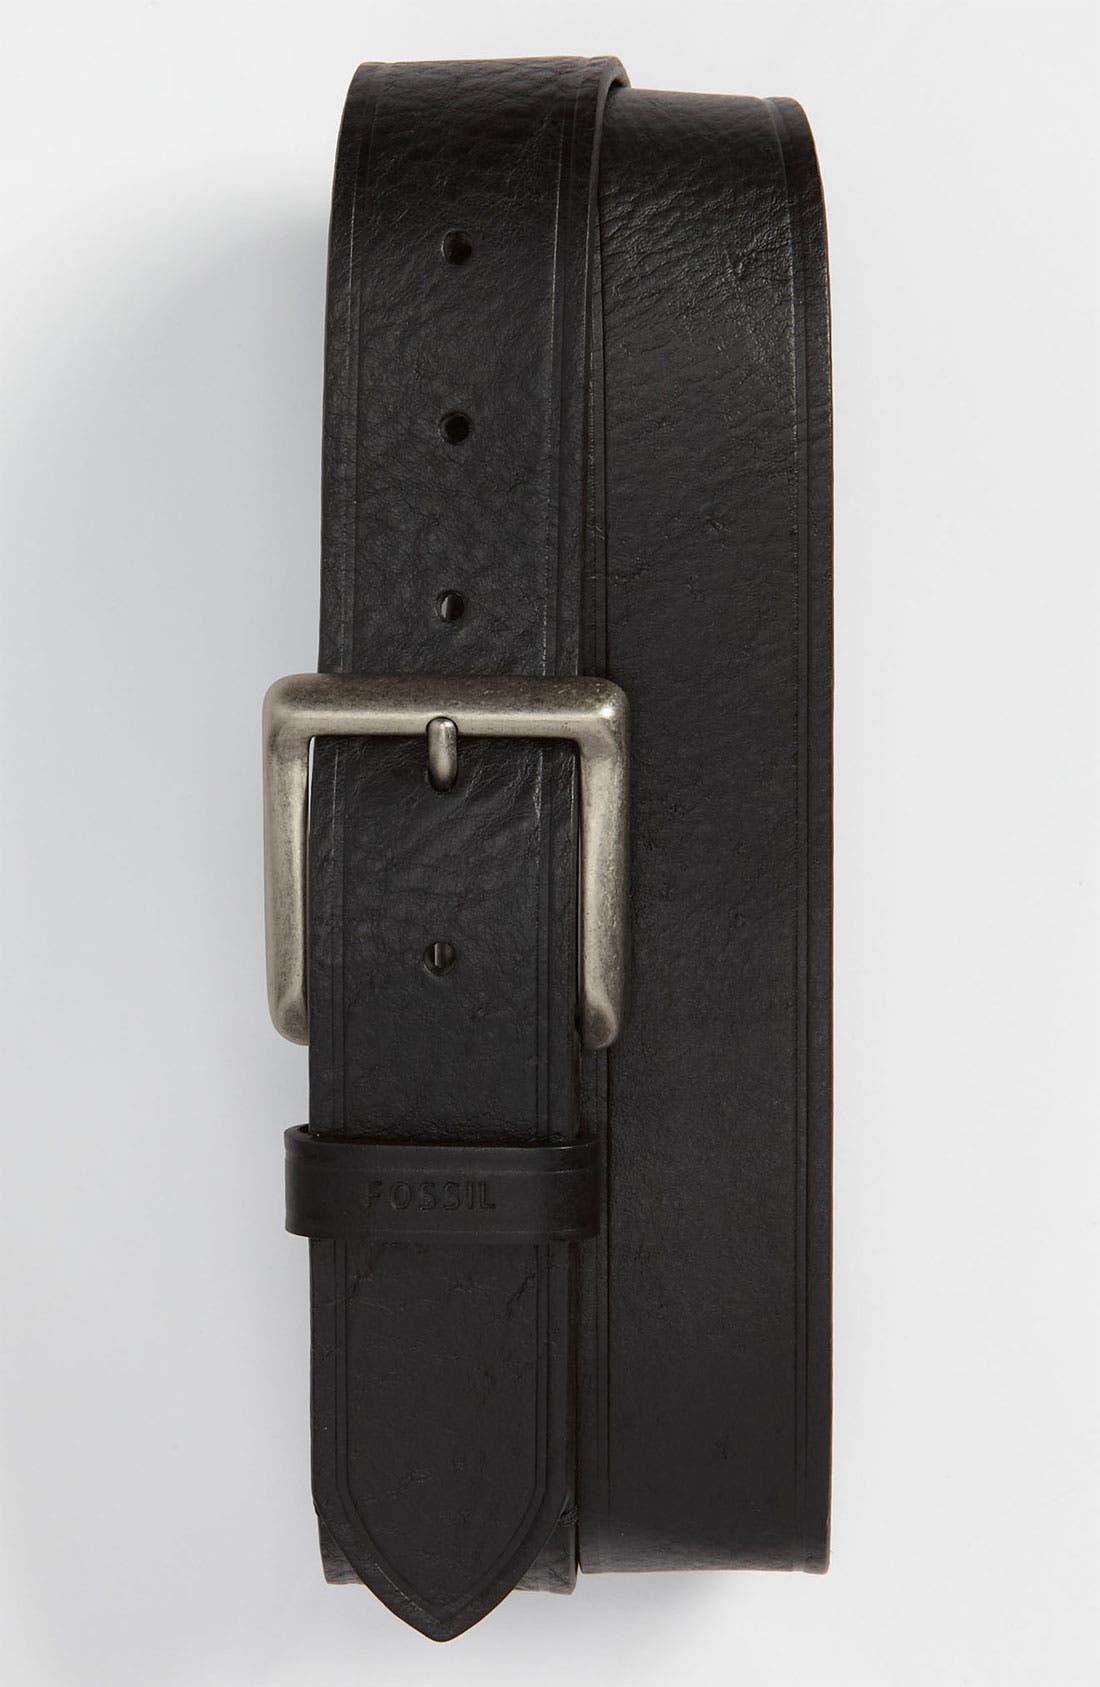 Main Image - Fossil 'Maxim' Leather Belt